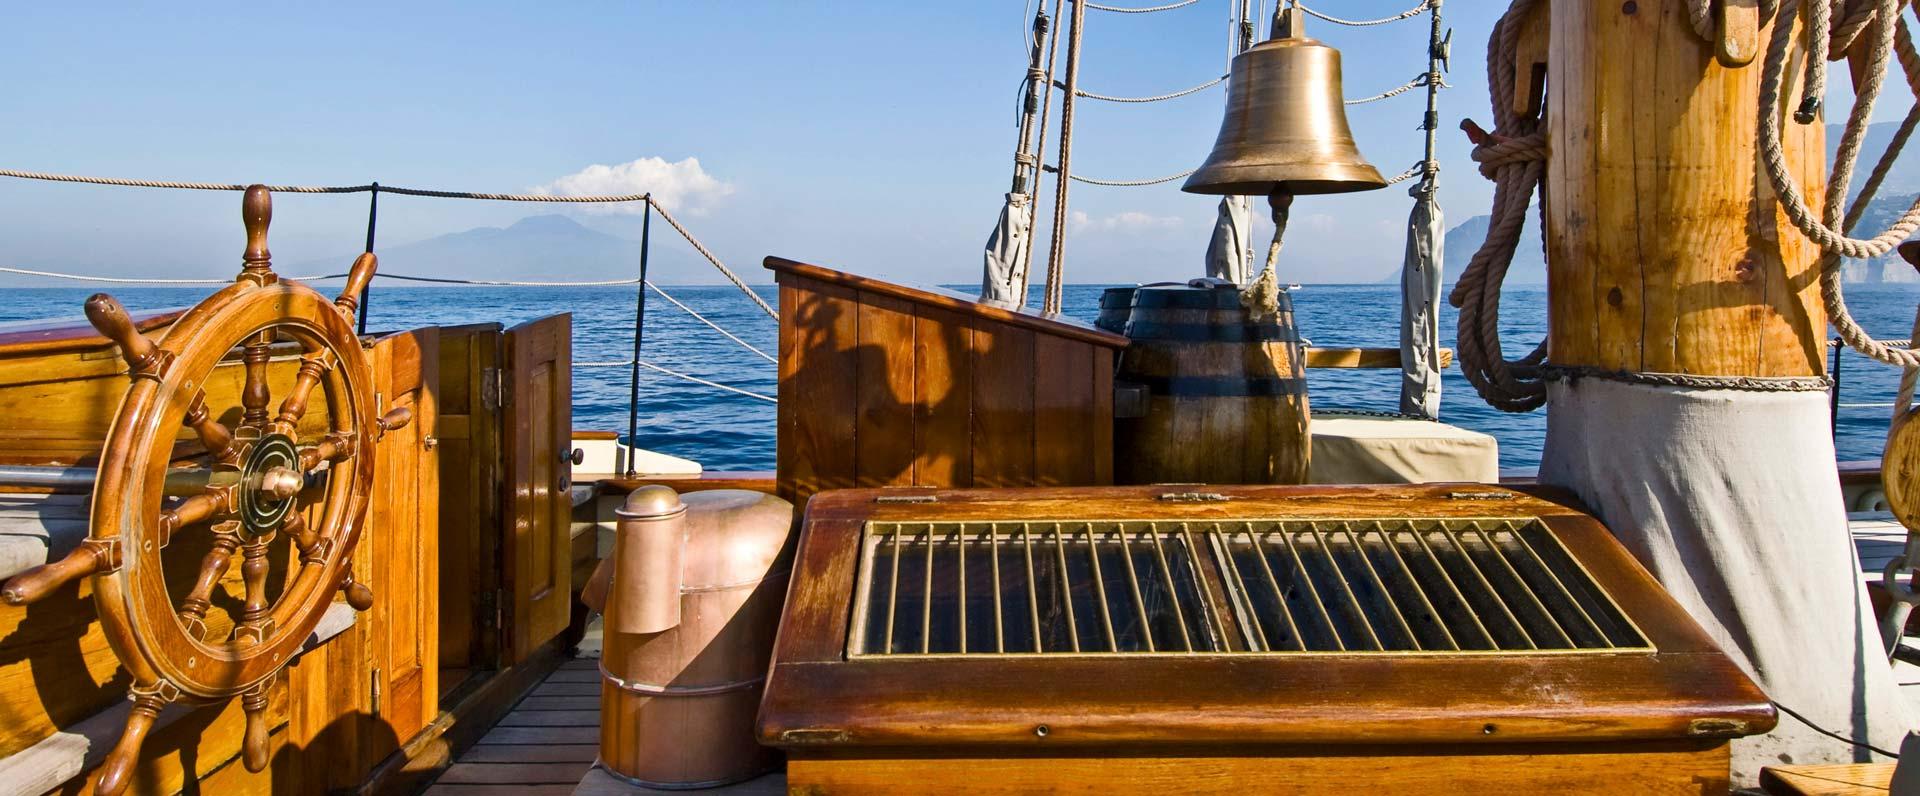 ketch vera antica imbarcazione